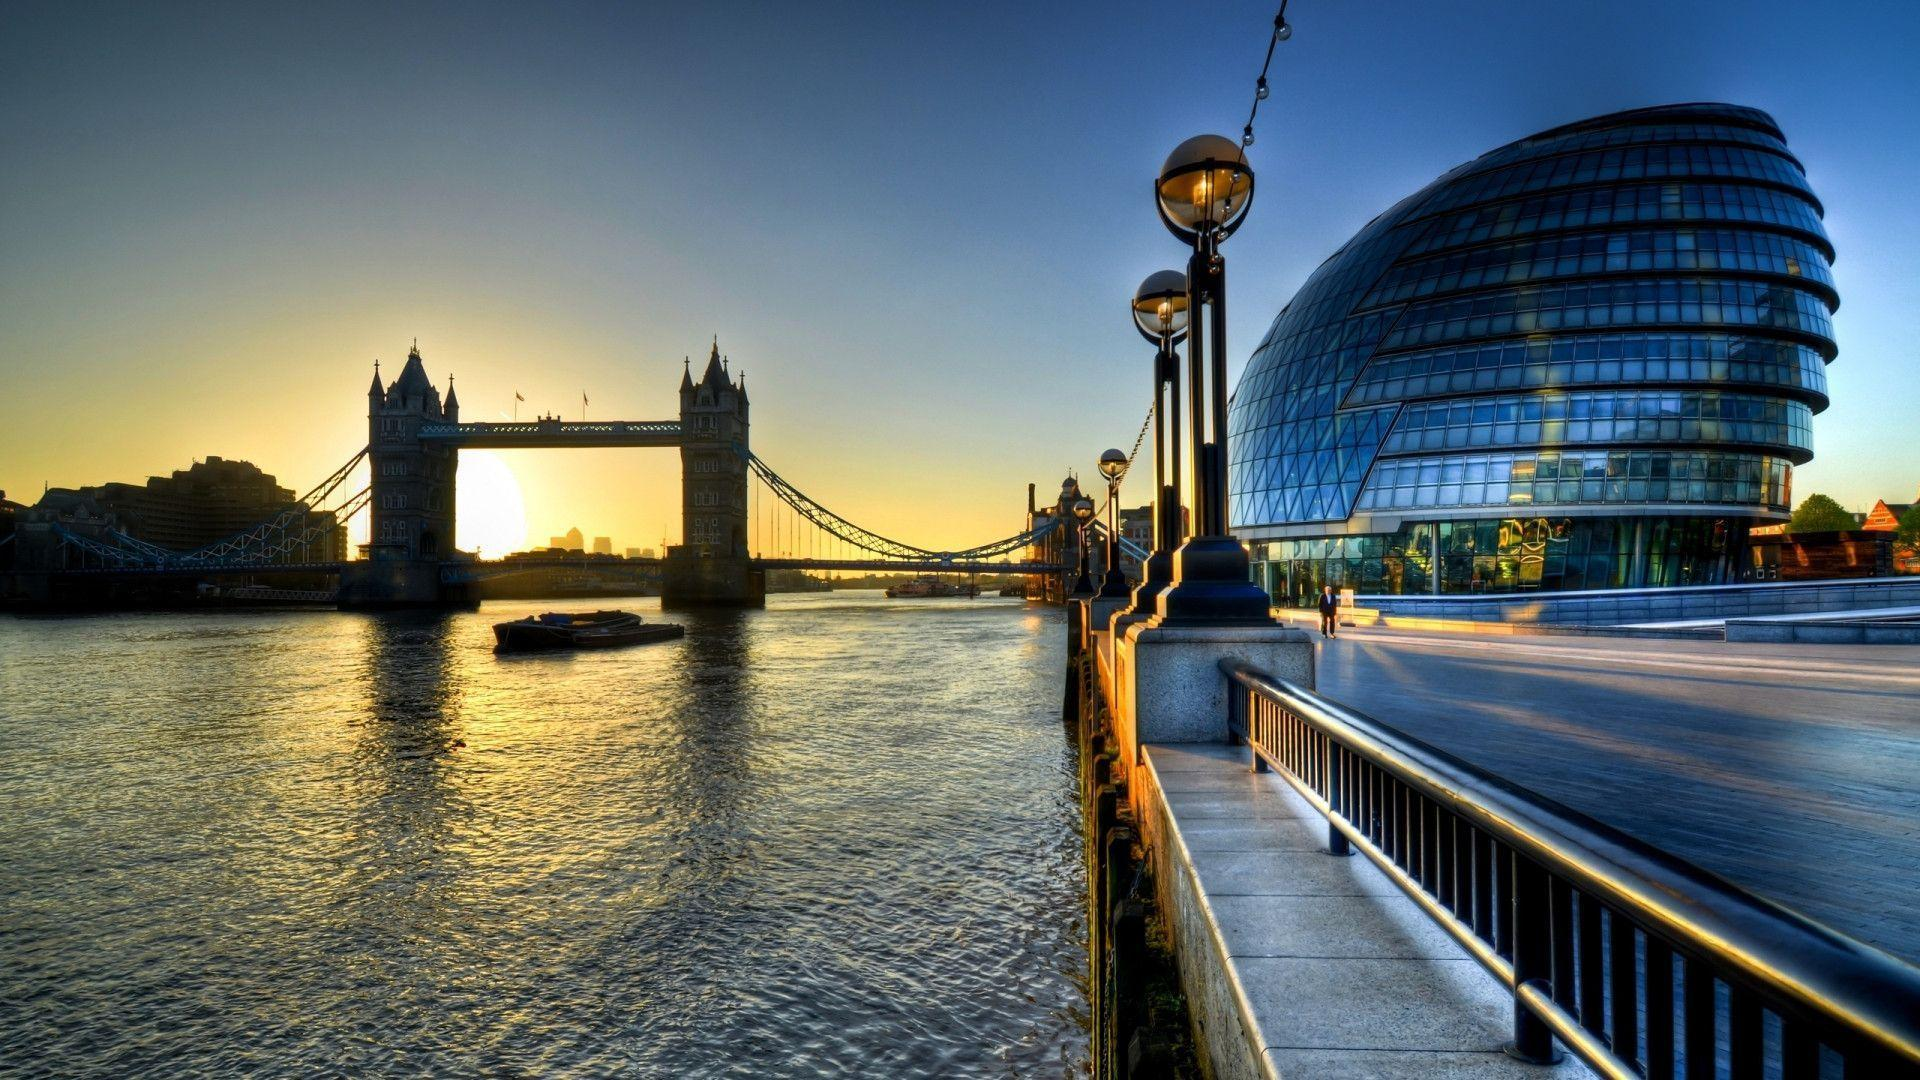 wallpaper bridge london scenic - photo #29